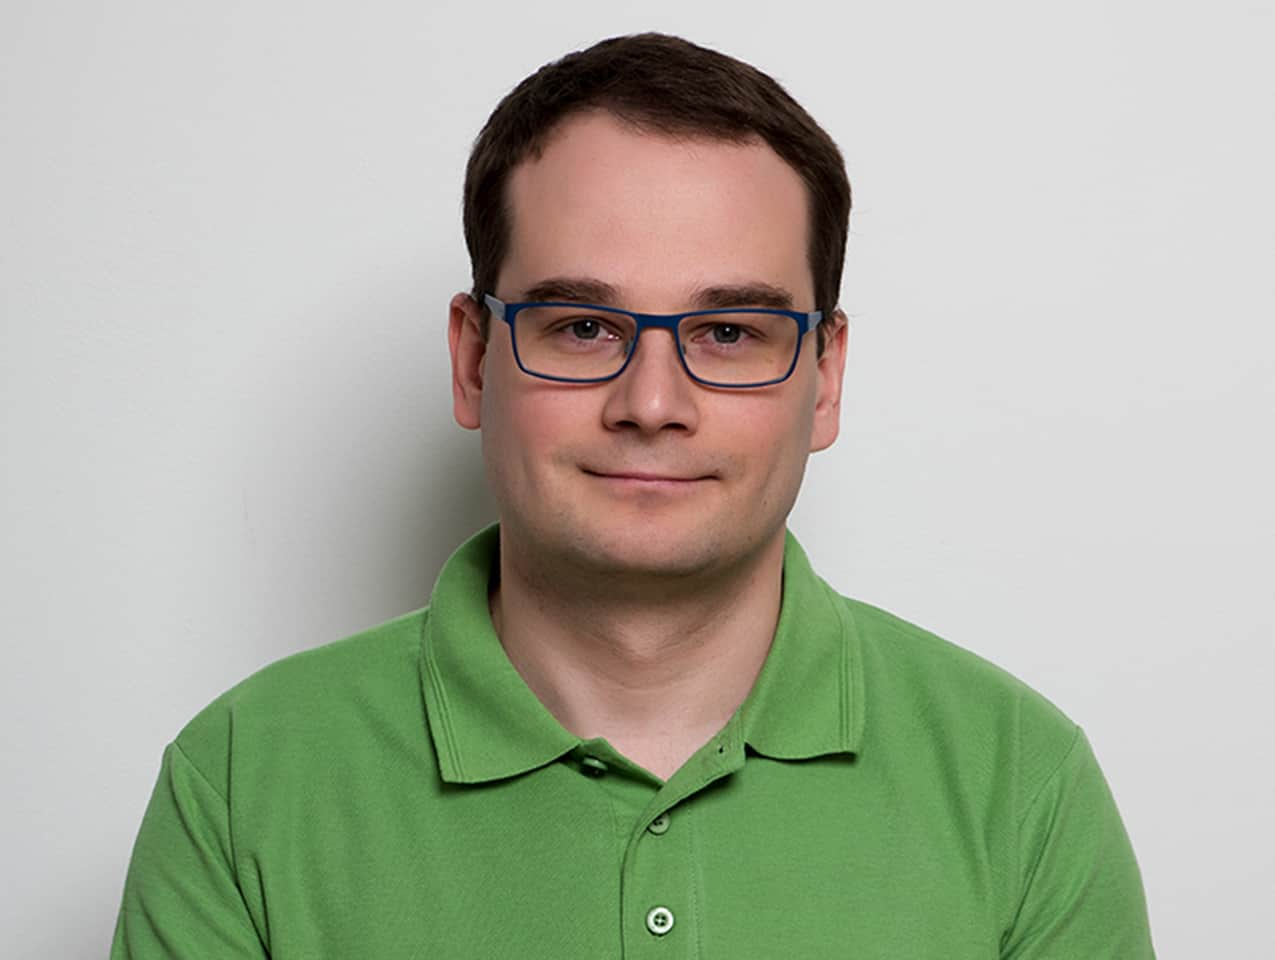 MUDr. Jakub Texl